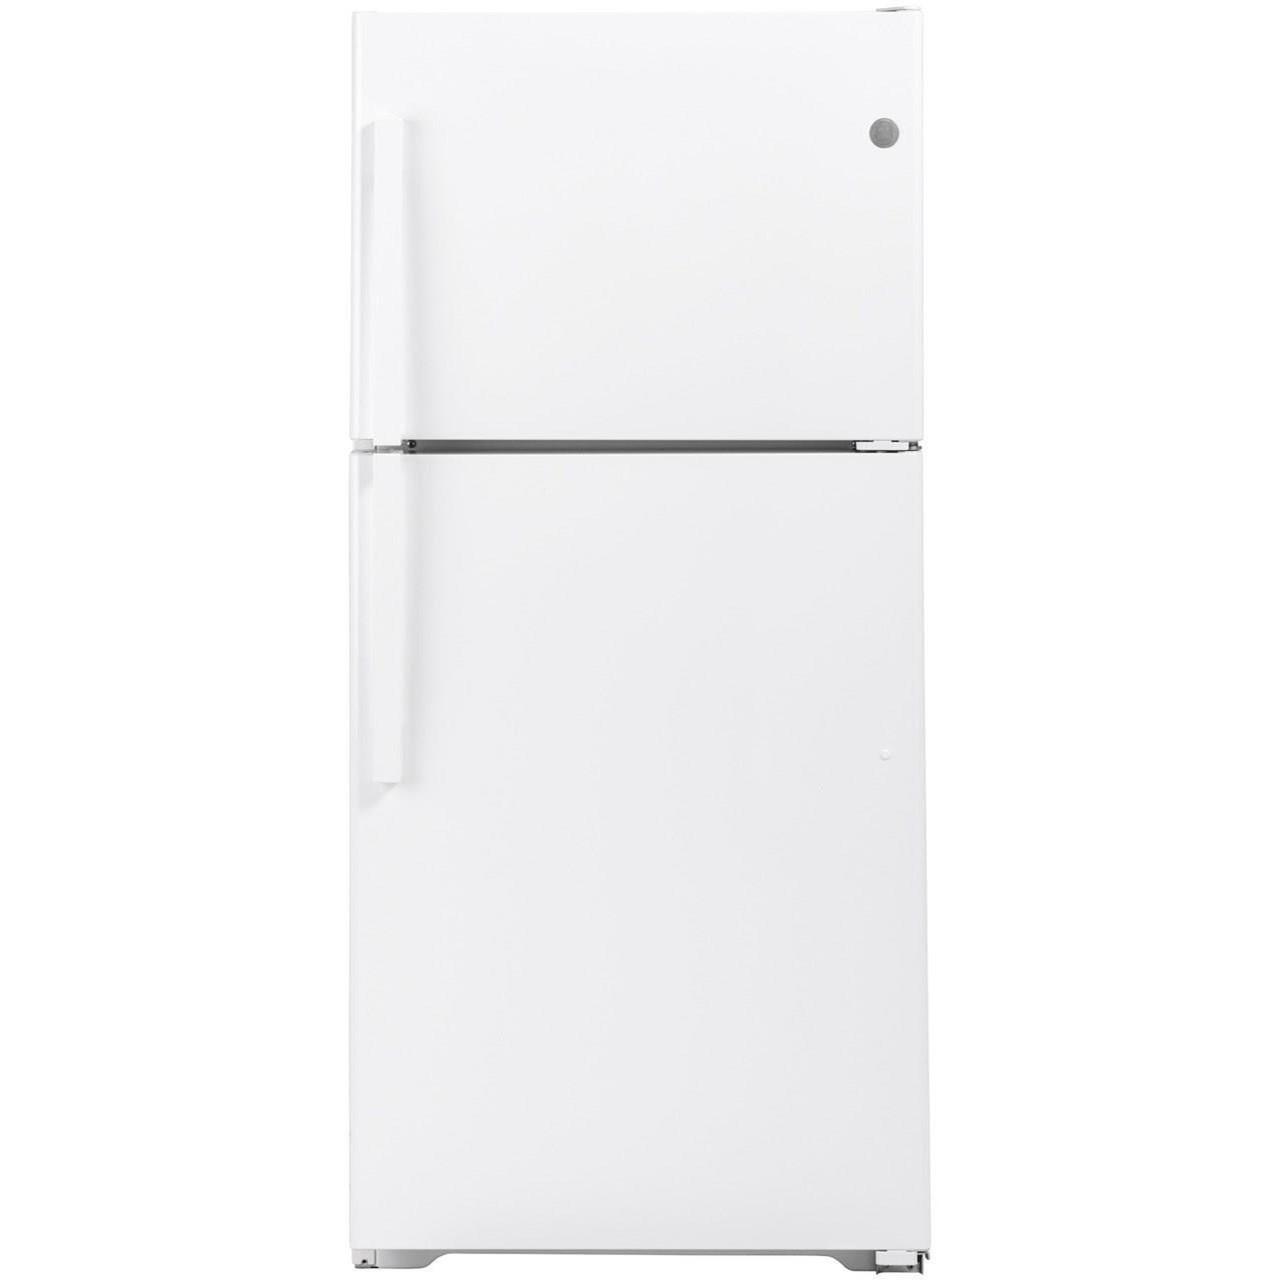 GE® 19.2 Cu. Ft. Top-Freezer Refrigerator